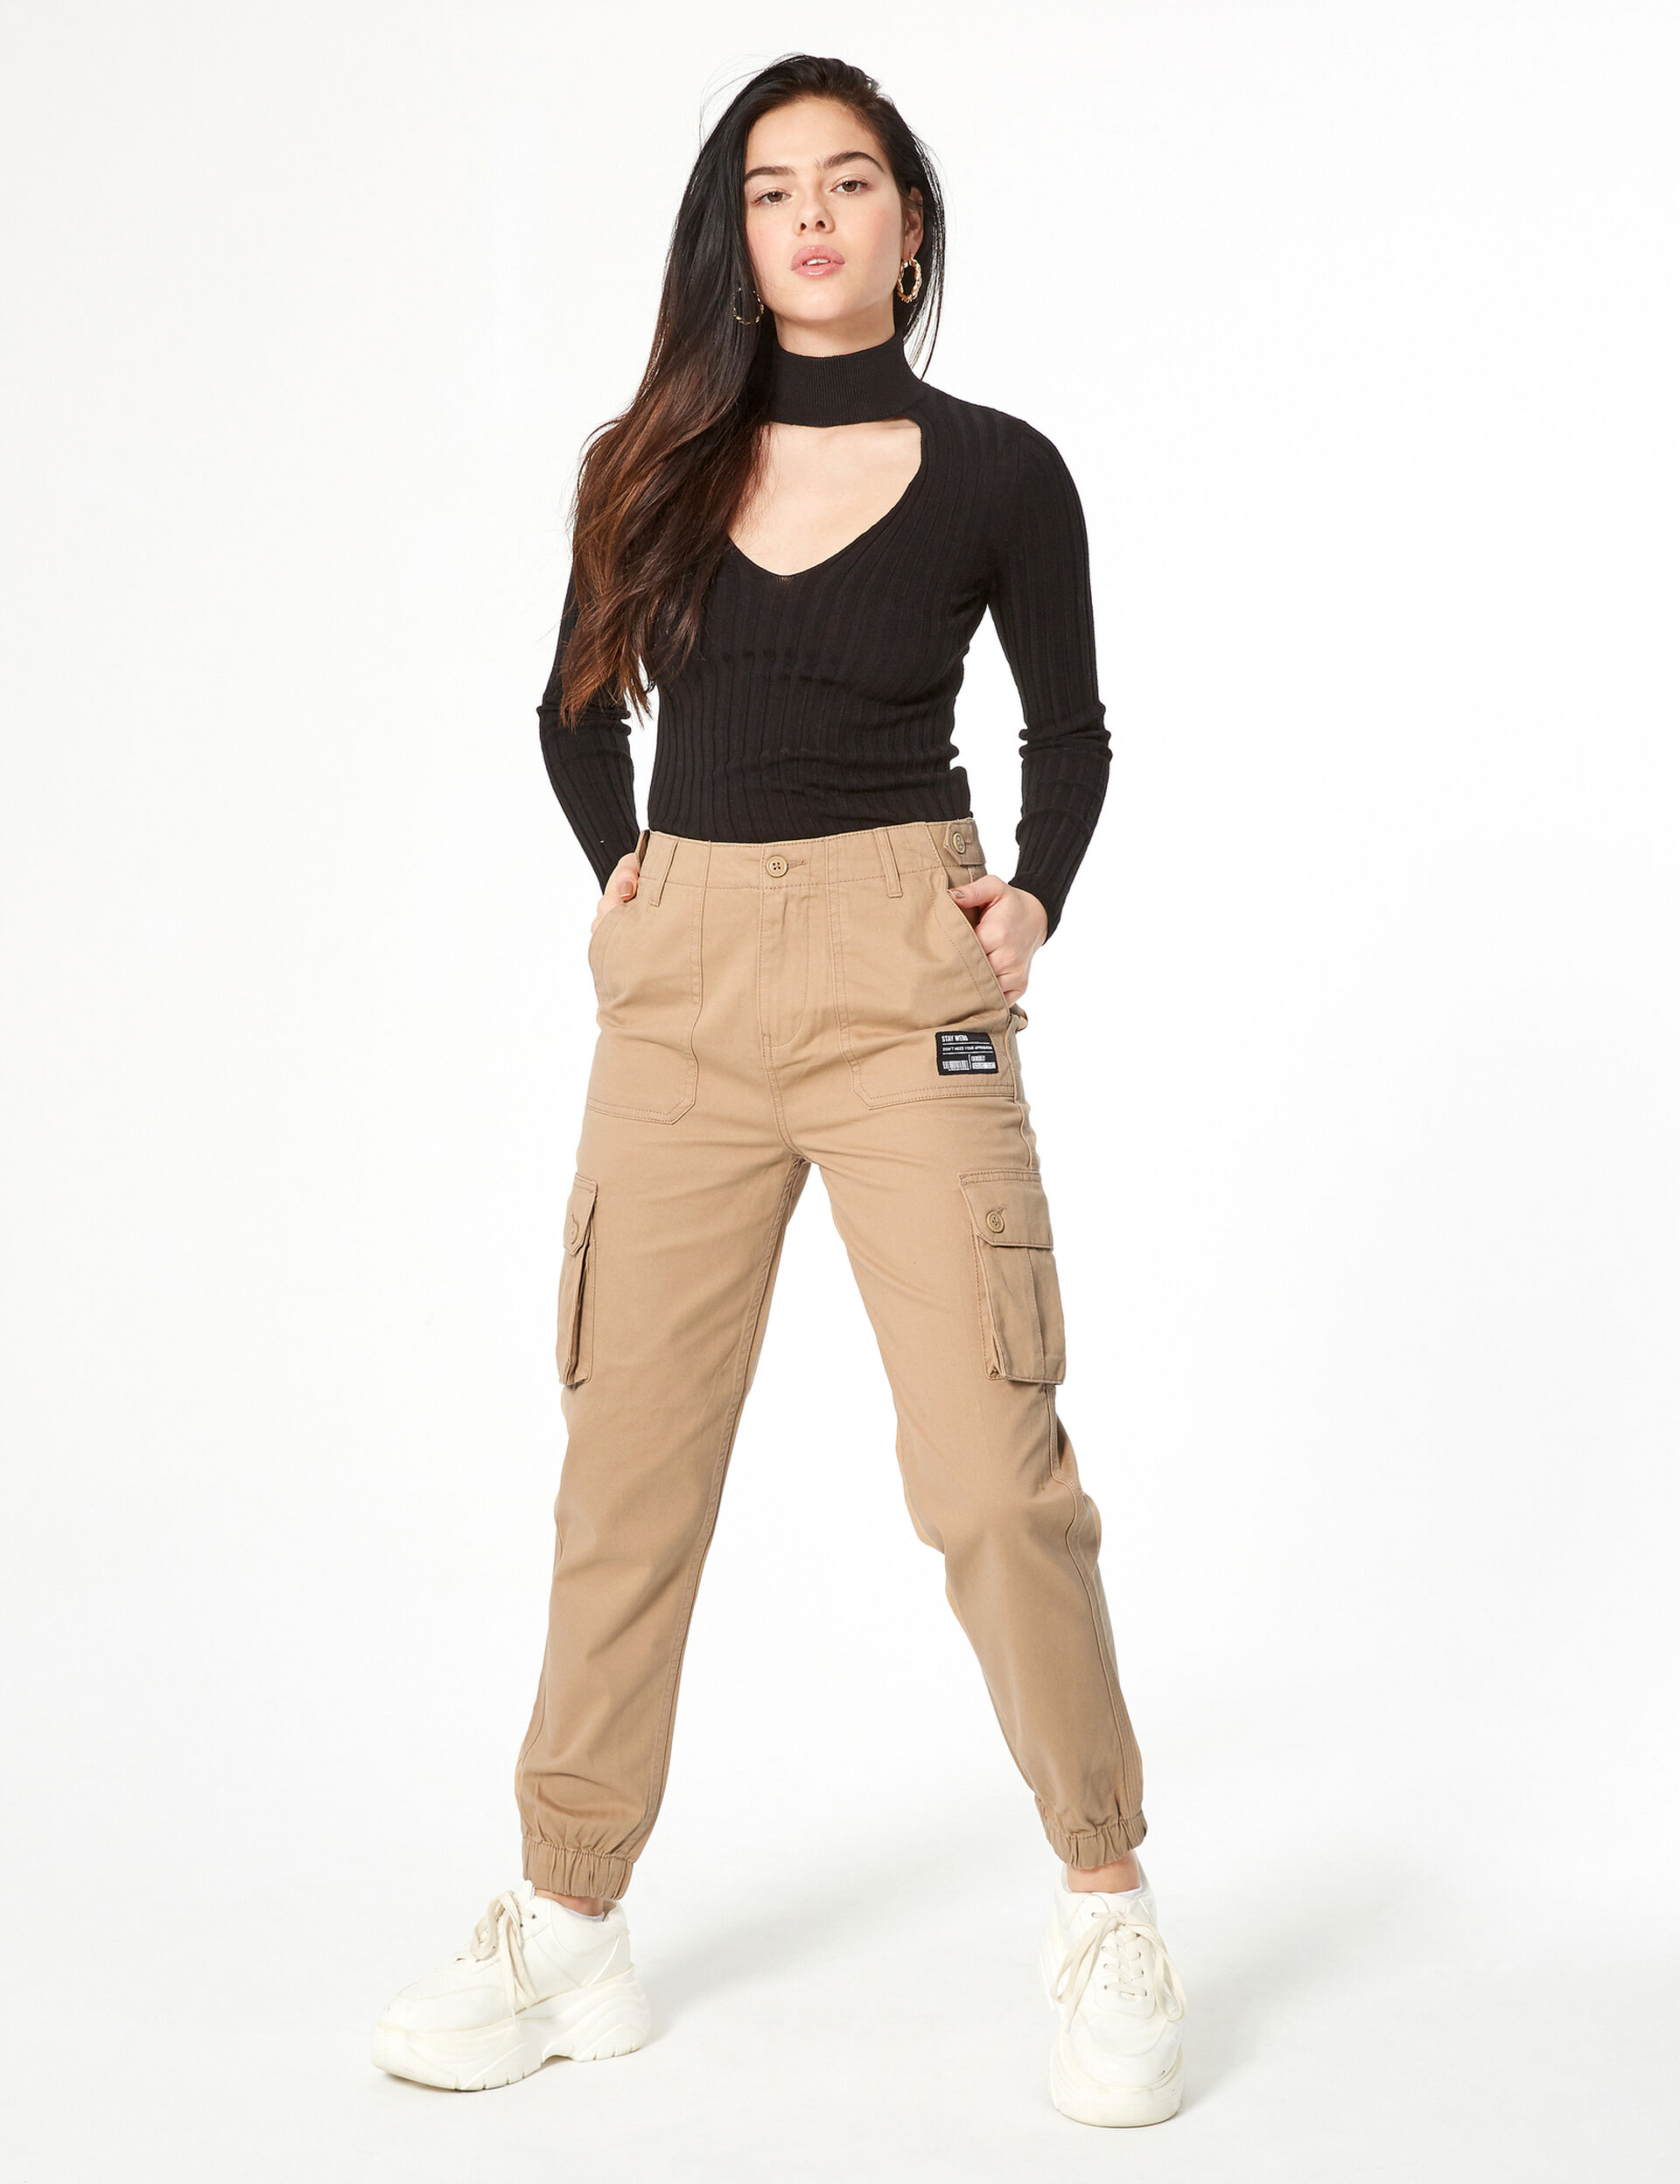 Beige cargo style pants